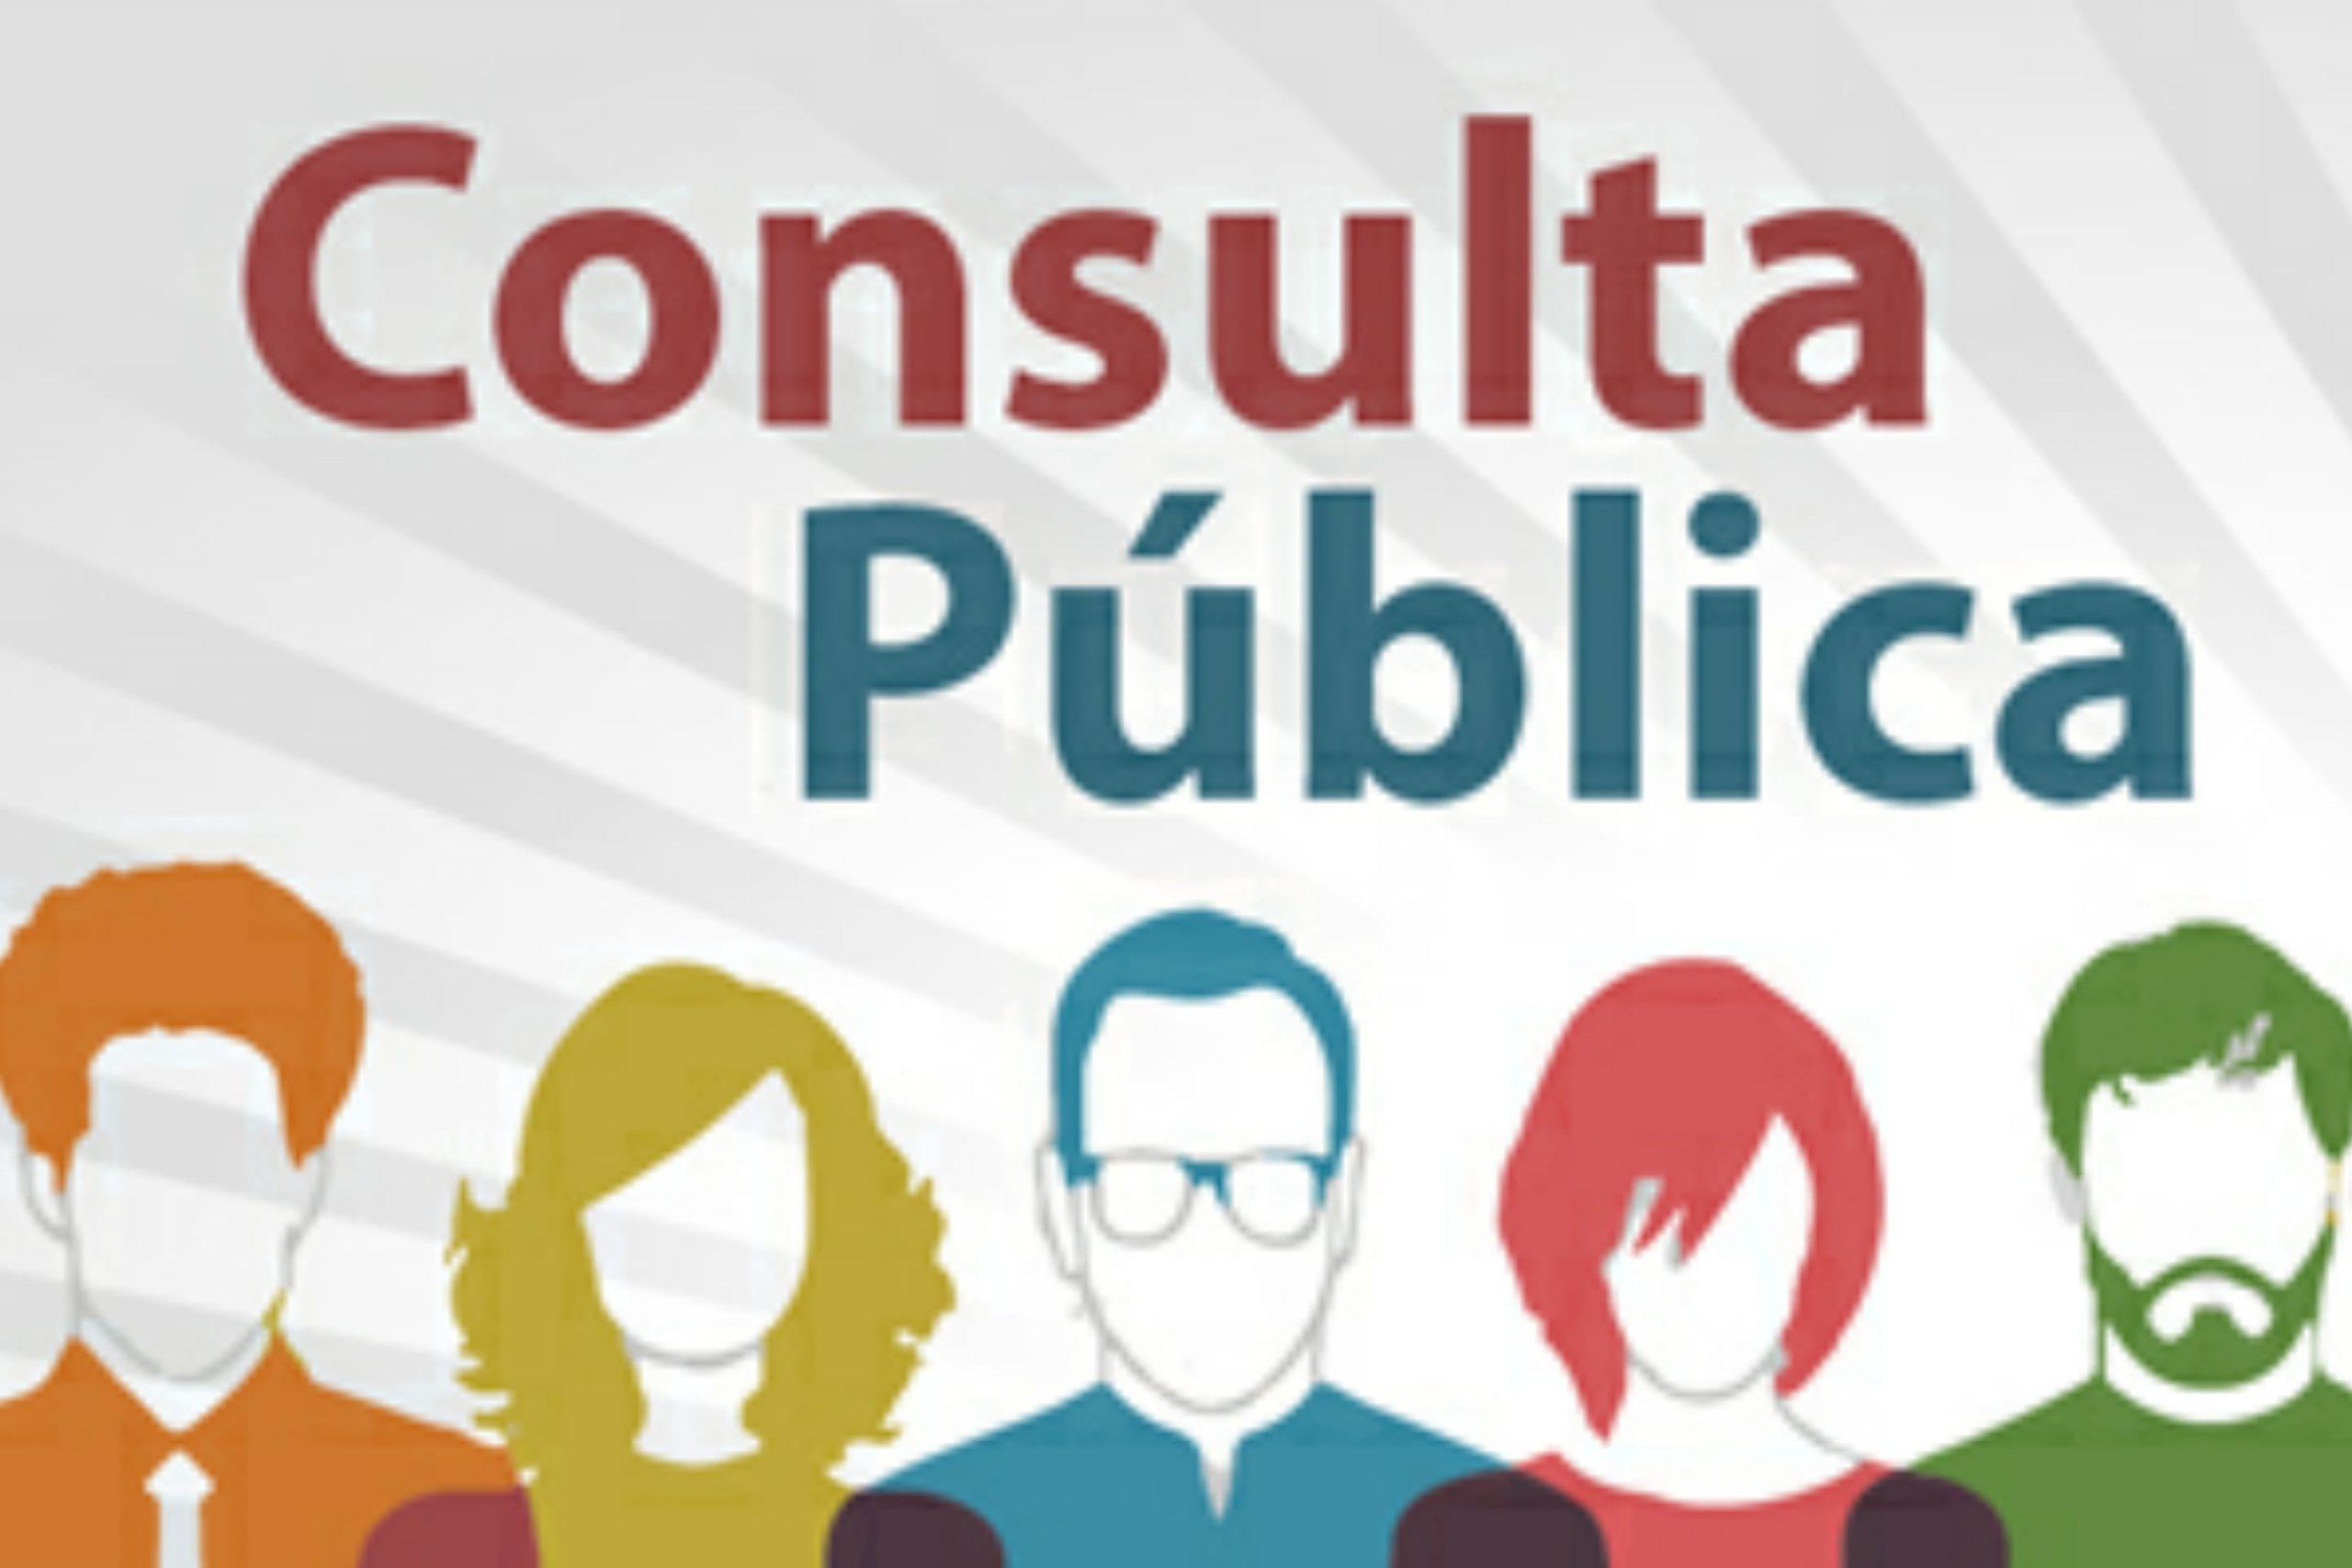 BOTUPORÃ – Consulta Pública para PREMAR II